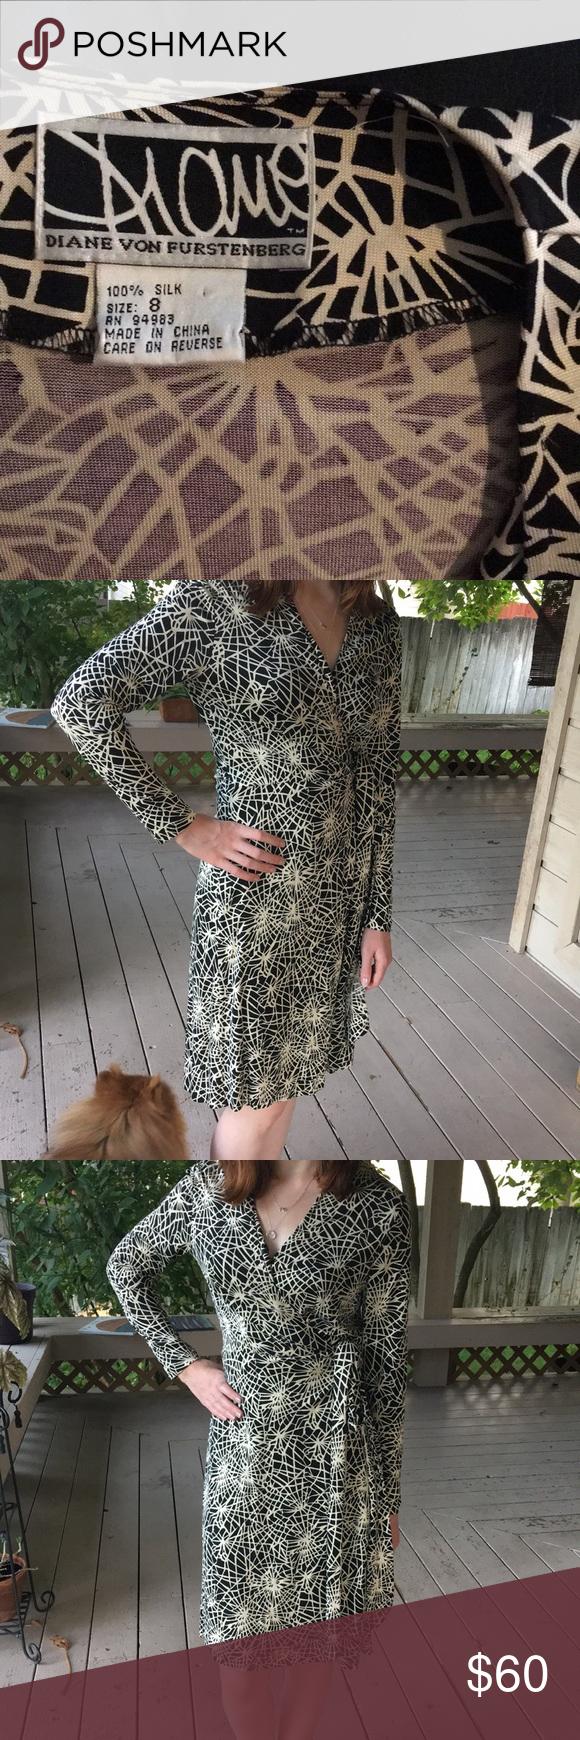 Diane Von Furstenberg Silk Wrap Dress Beautiful Dvf Wrap Dress In Perfect Vintage Condition Diane Von Furstenb Silk Wrap Dresses Dvf Wrap Dress Wrap Dress [ 1740 x 580 Pixel ]